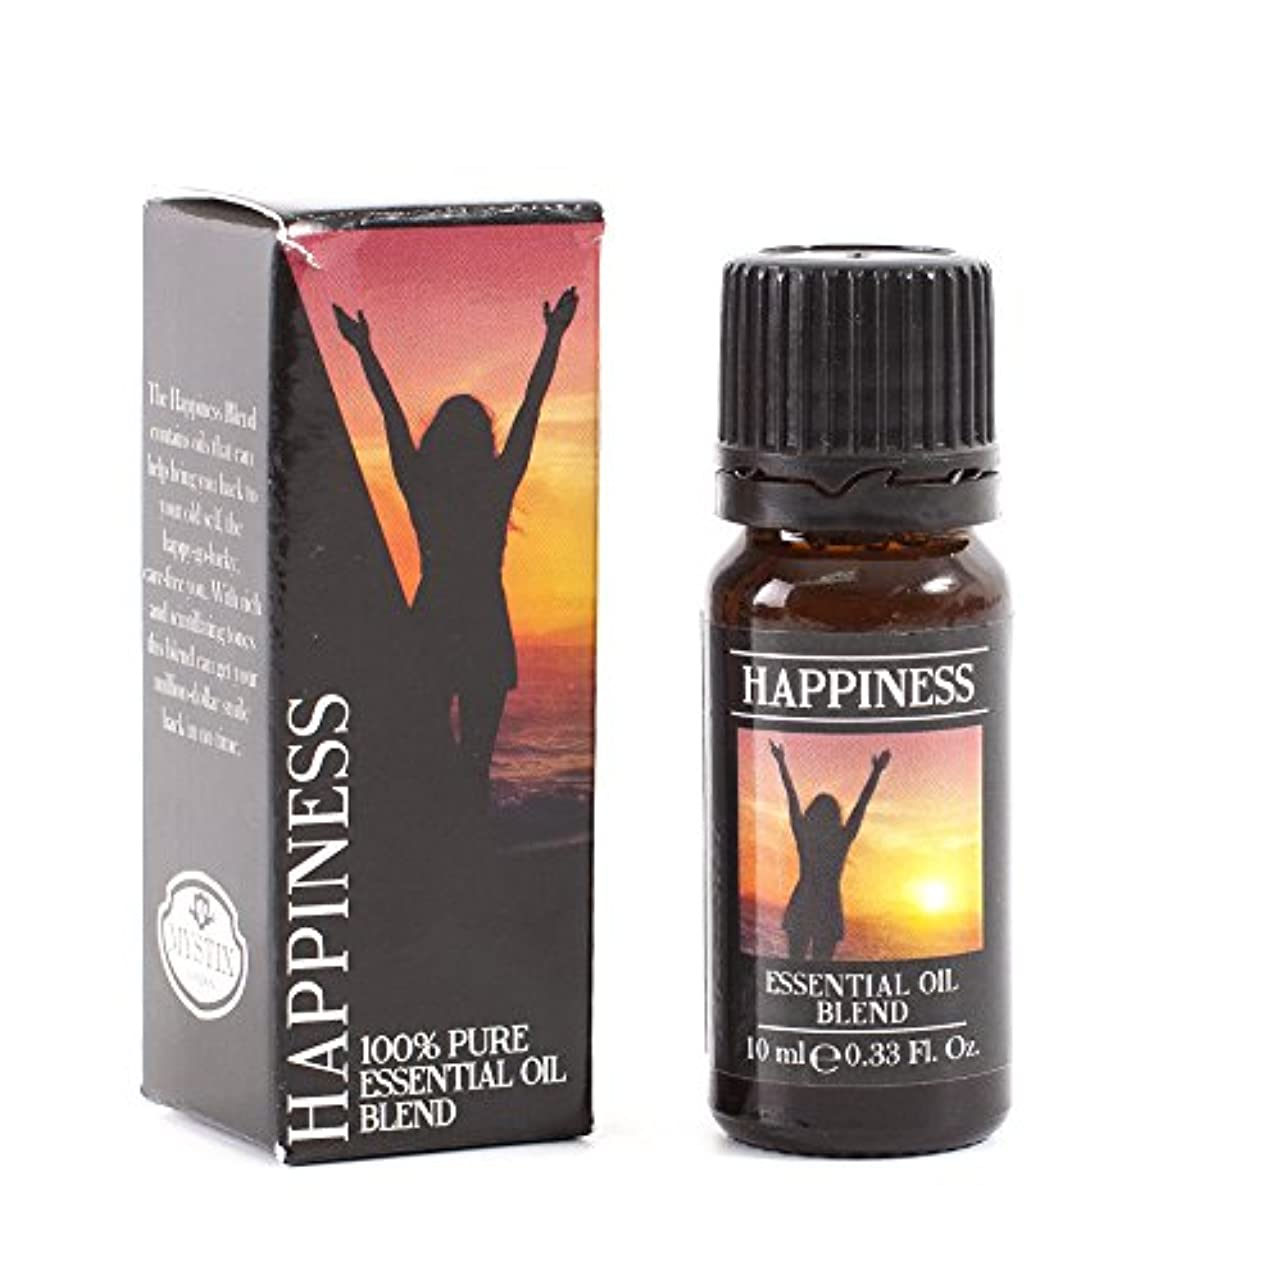 Mystix London | Happiness Essential Oil Blend - 10ml - 100% Pure